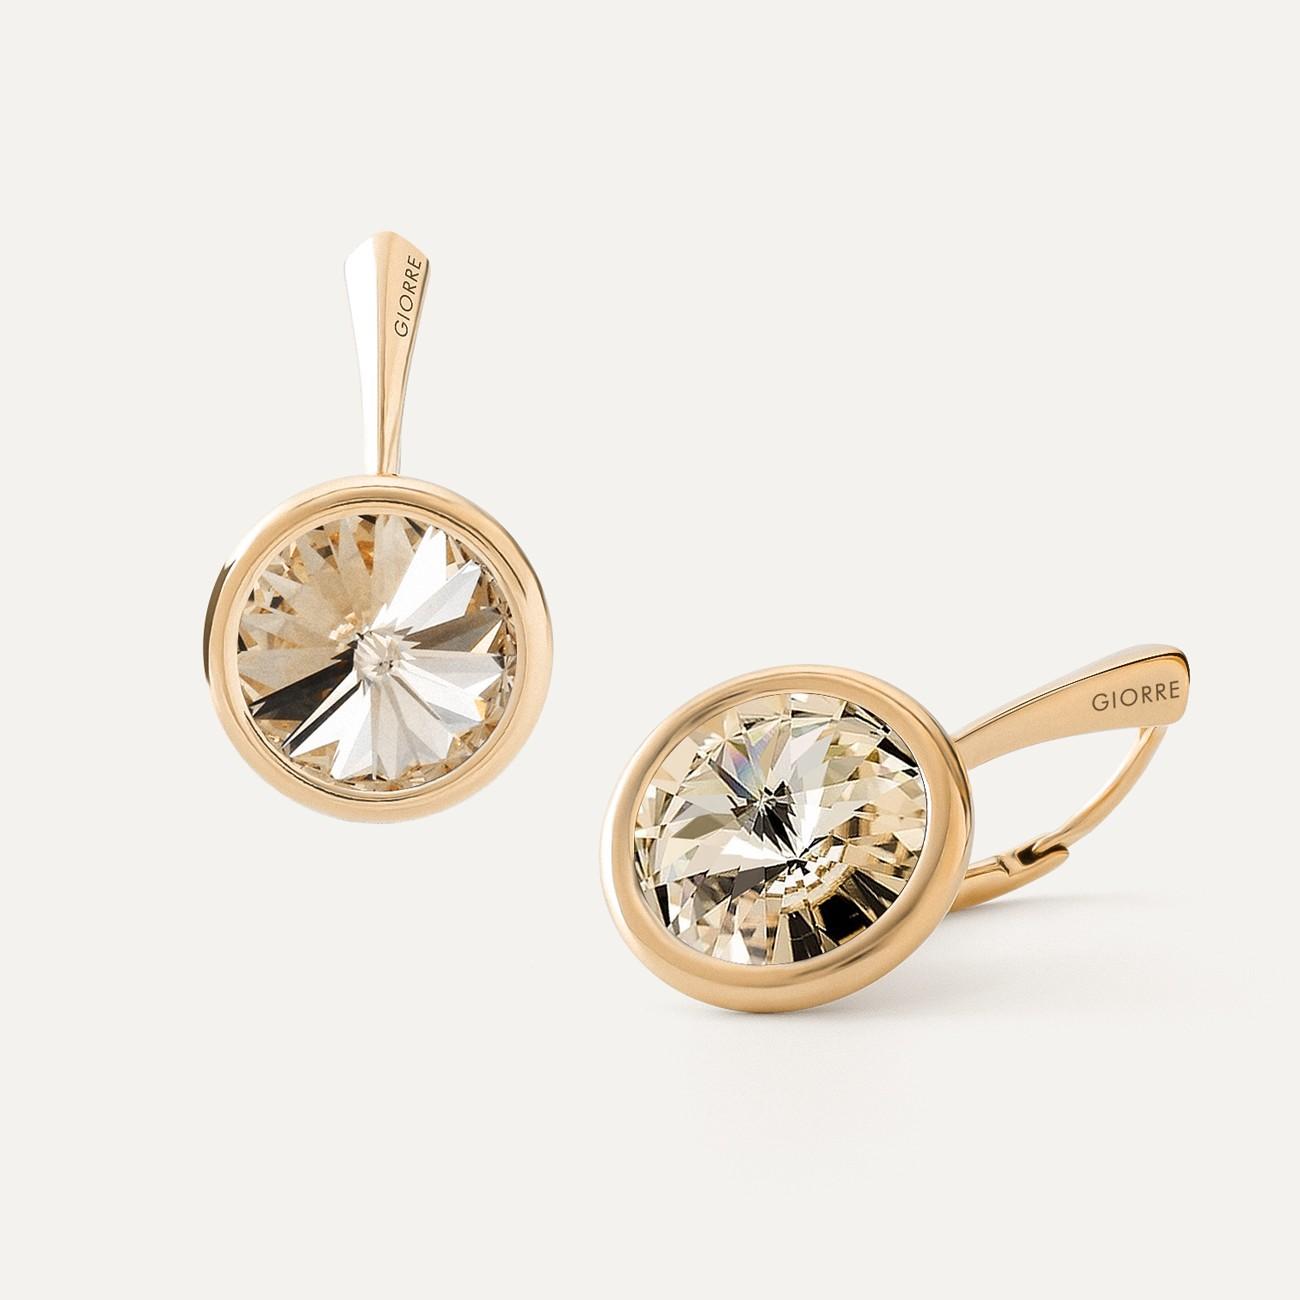 RIVOLI EARRINGS, SWAROVSKI 1122 MM 10, STERLING SILVER (925) RHODIUM OR GOLD PLATED